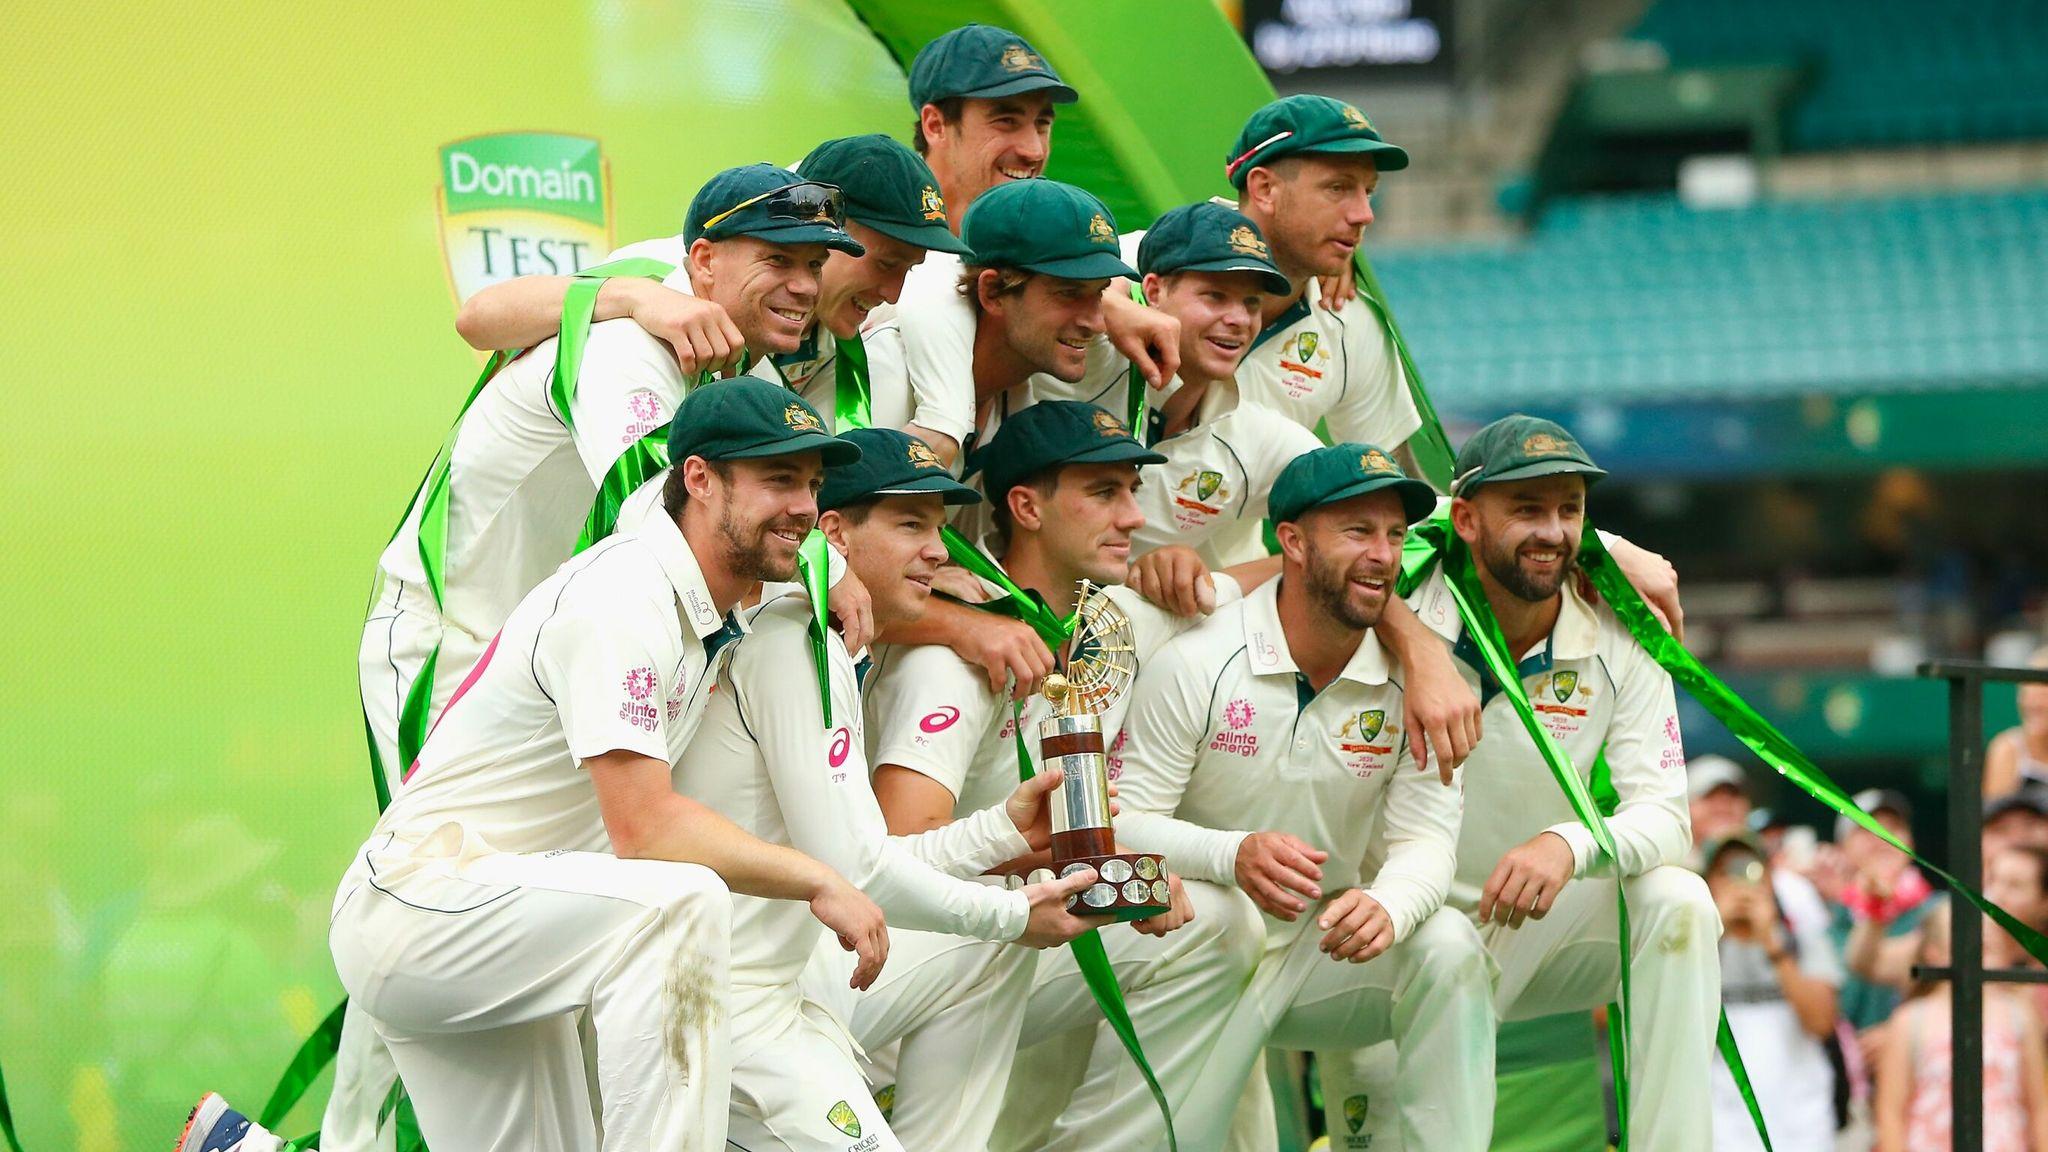 ICC adjusts World Test Championship points system following COVID-19 disruption | Cricket News | Sky Sports